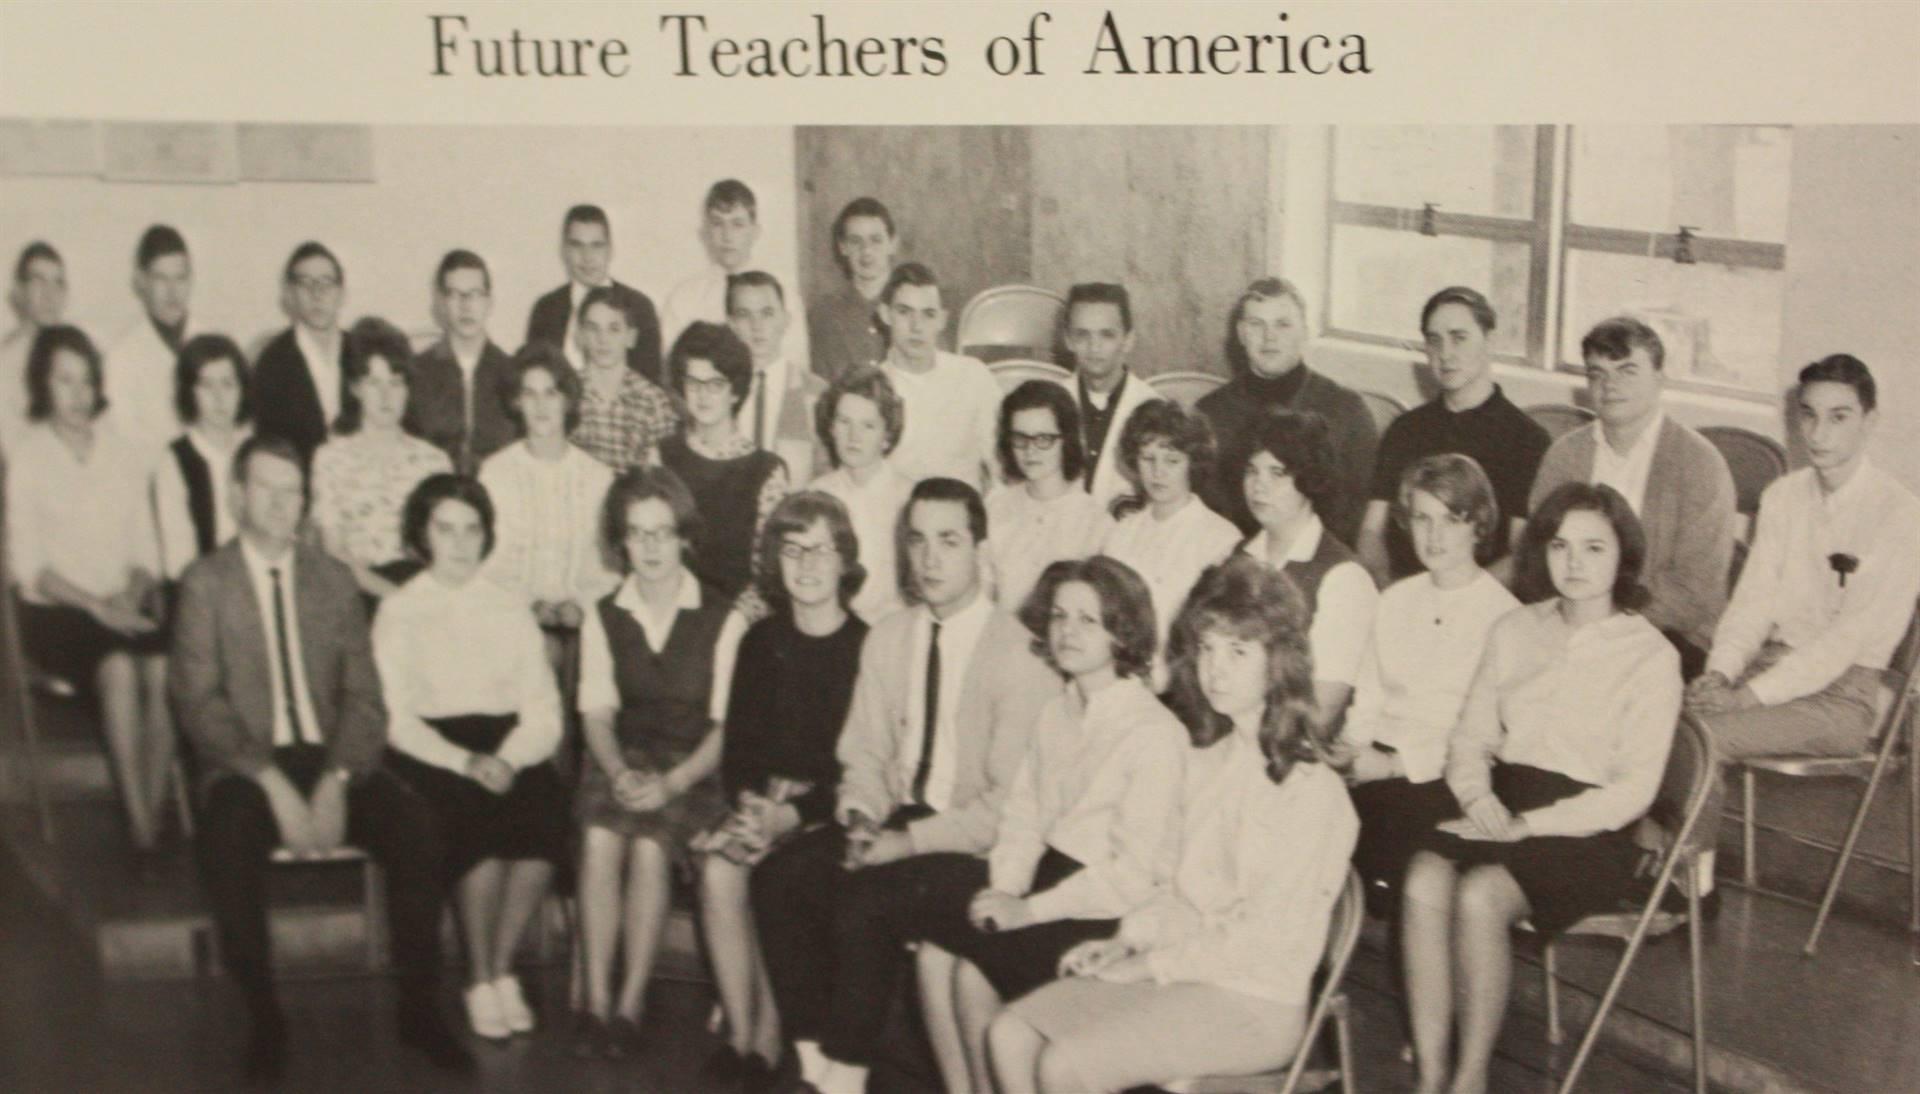 1966 Future Teachers of America